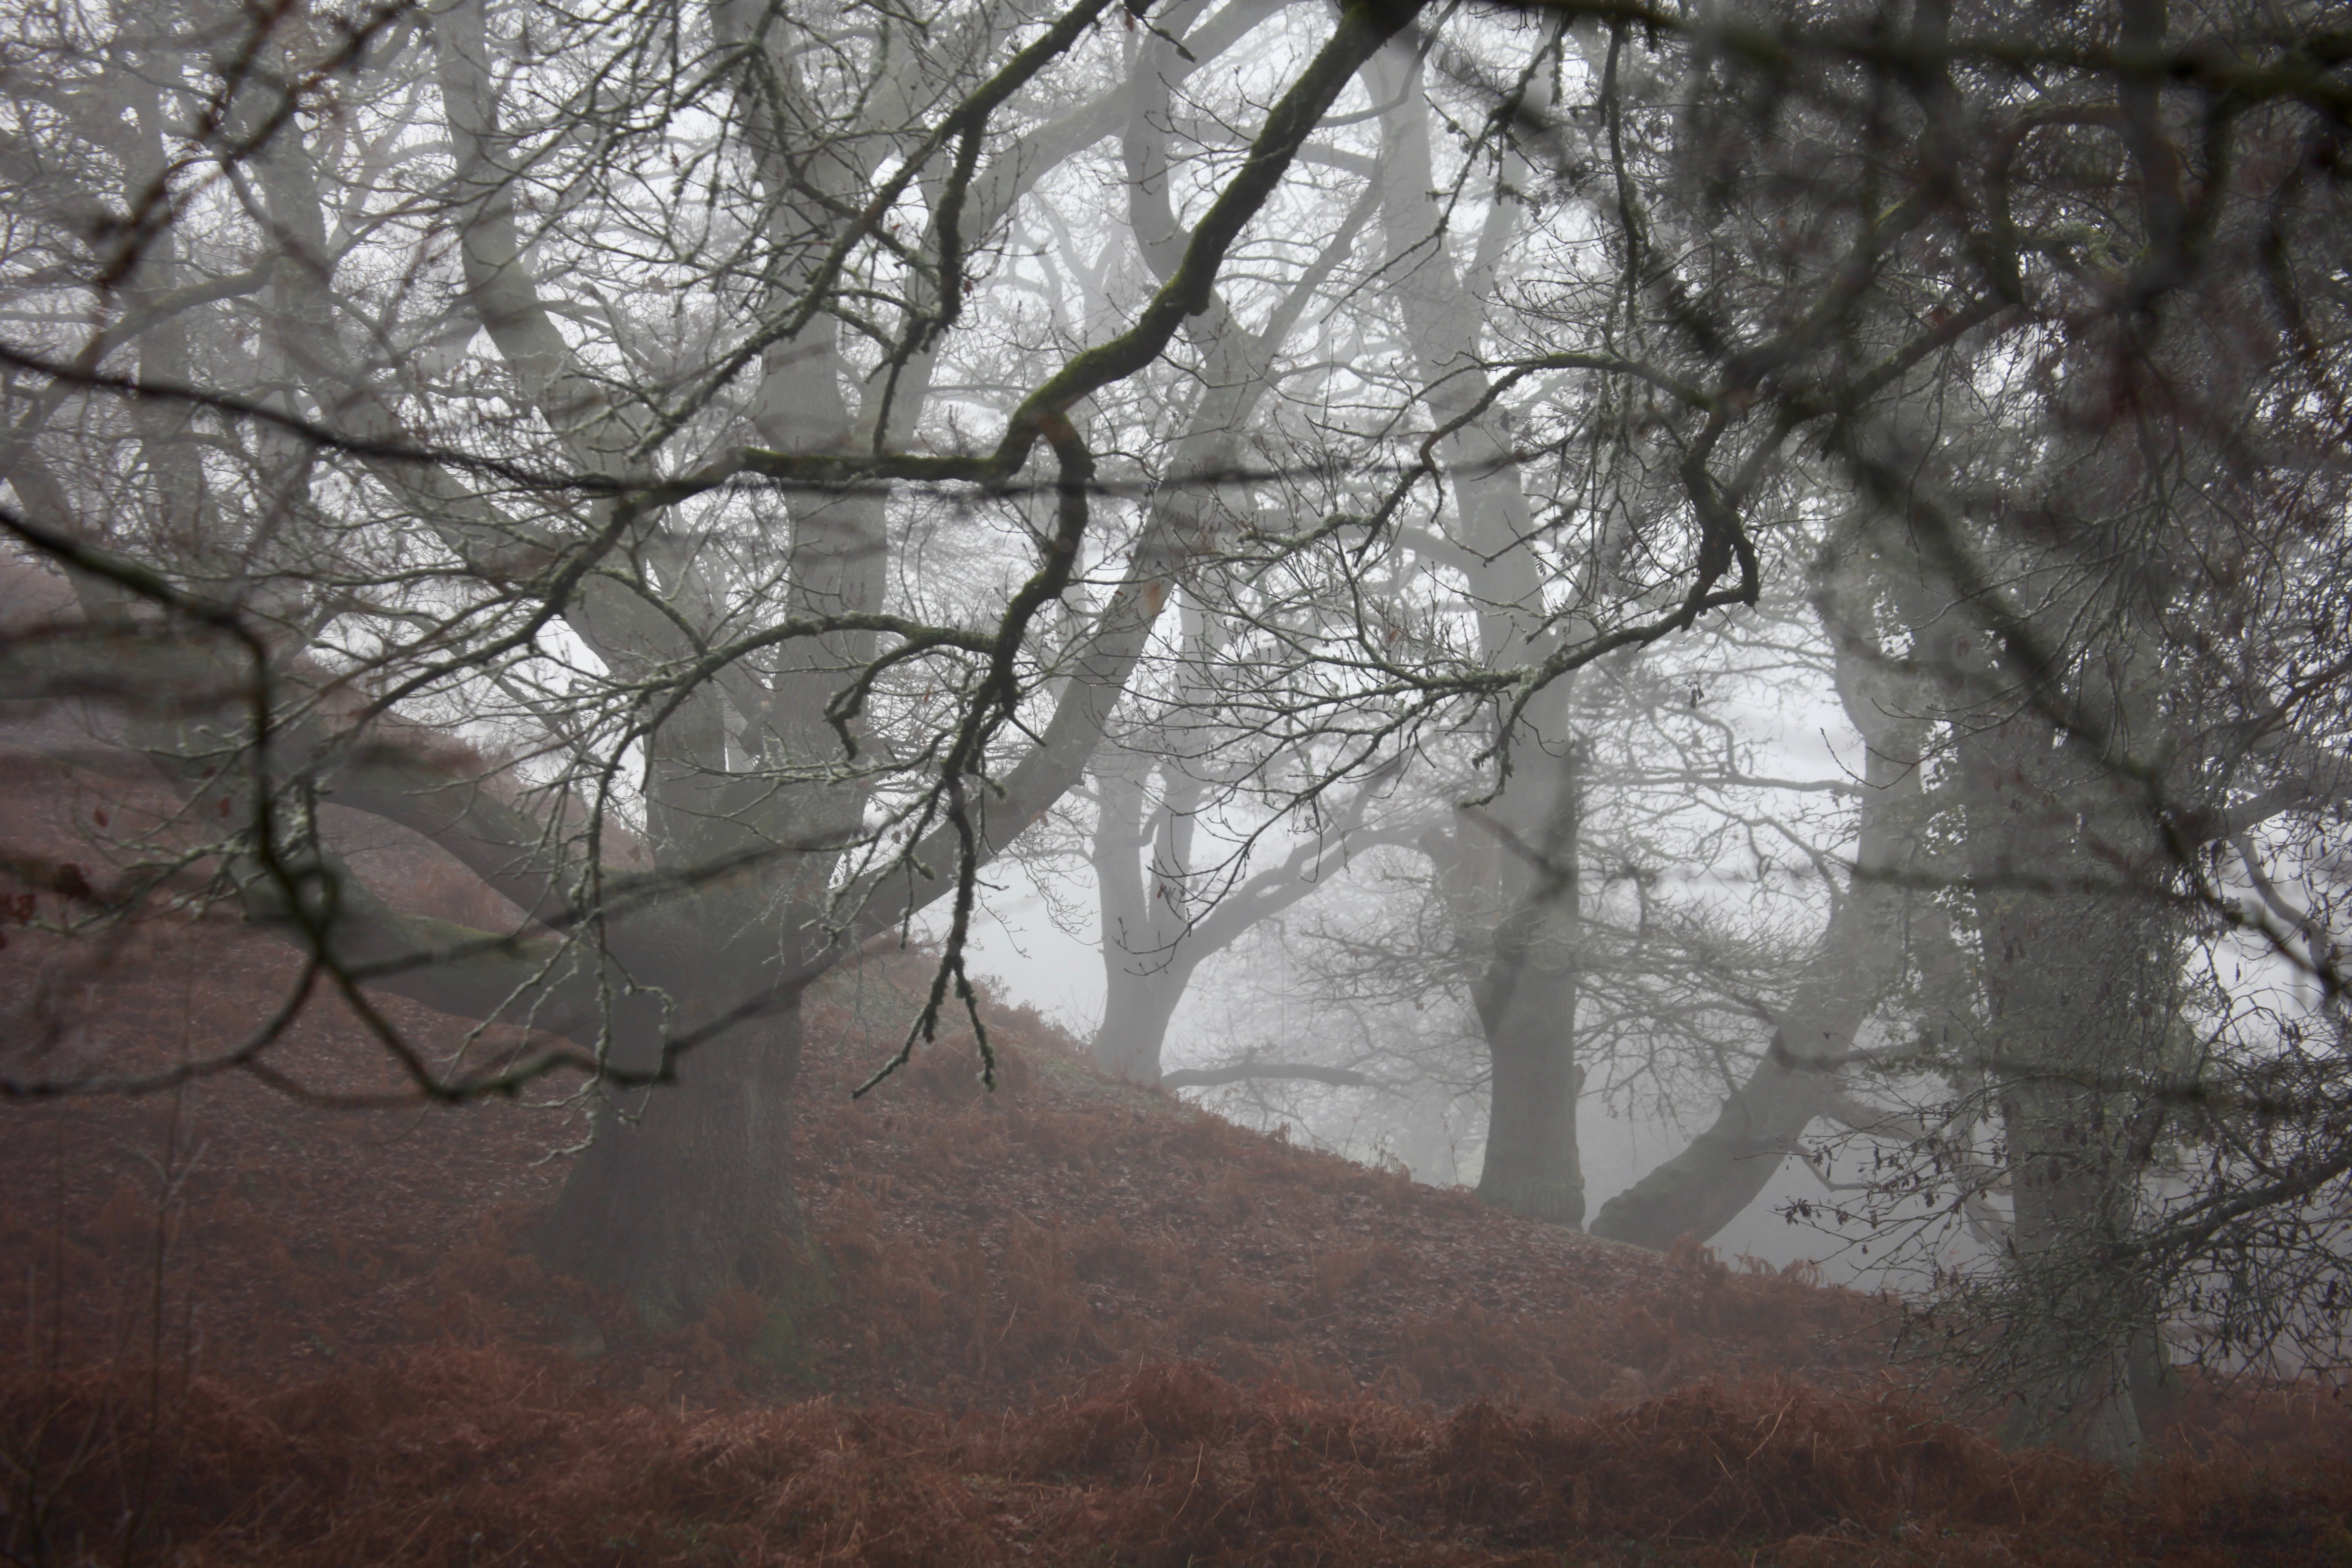 Trees and bracken in mist